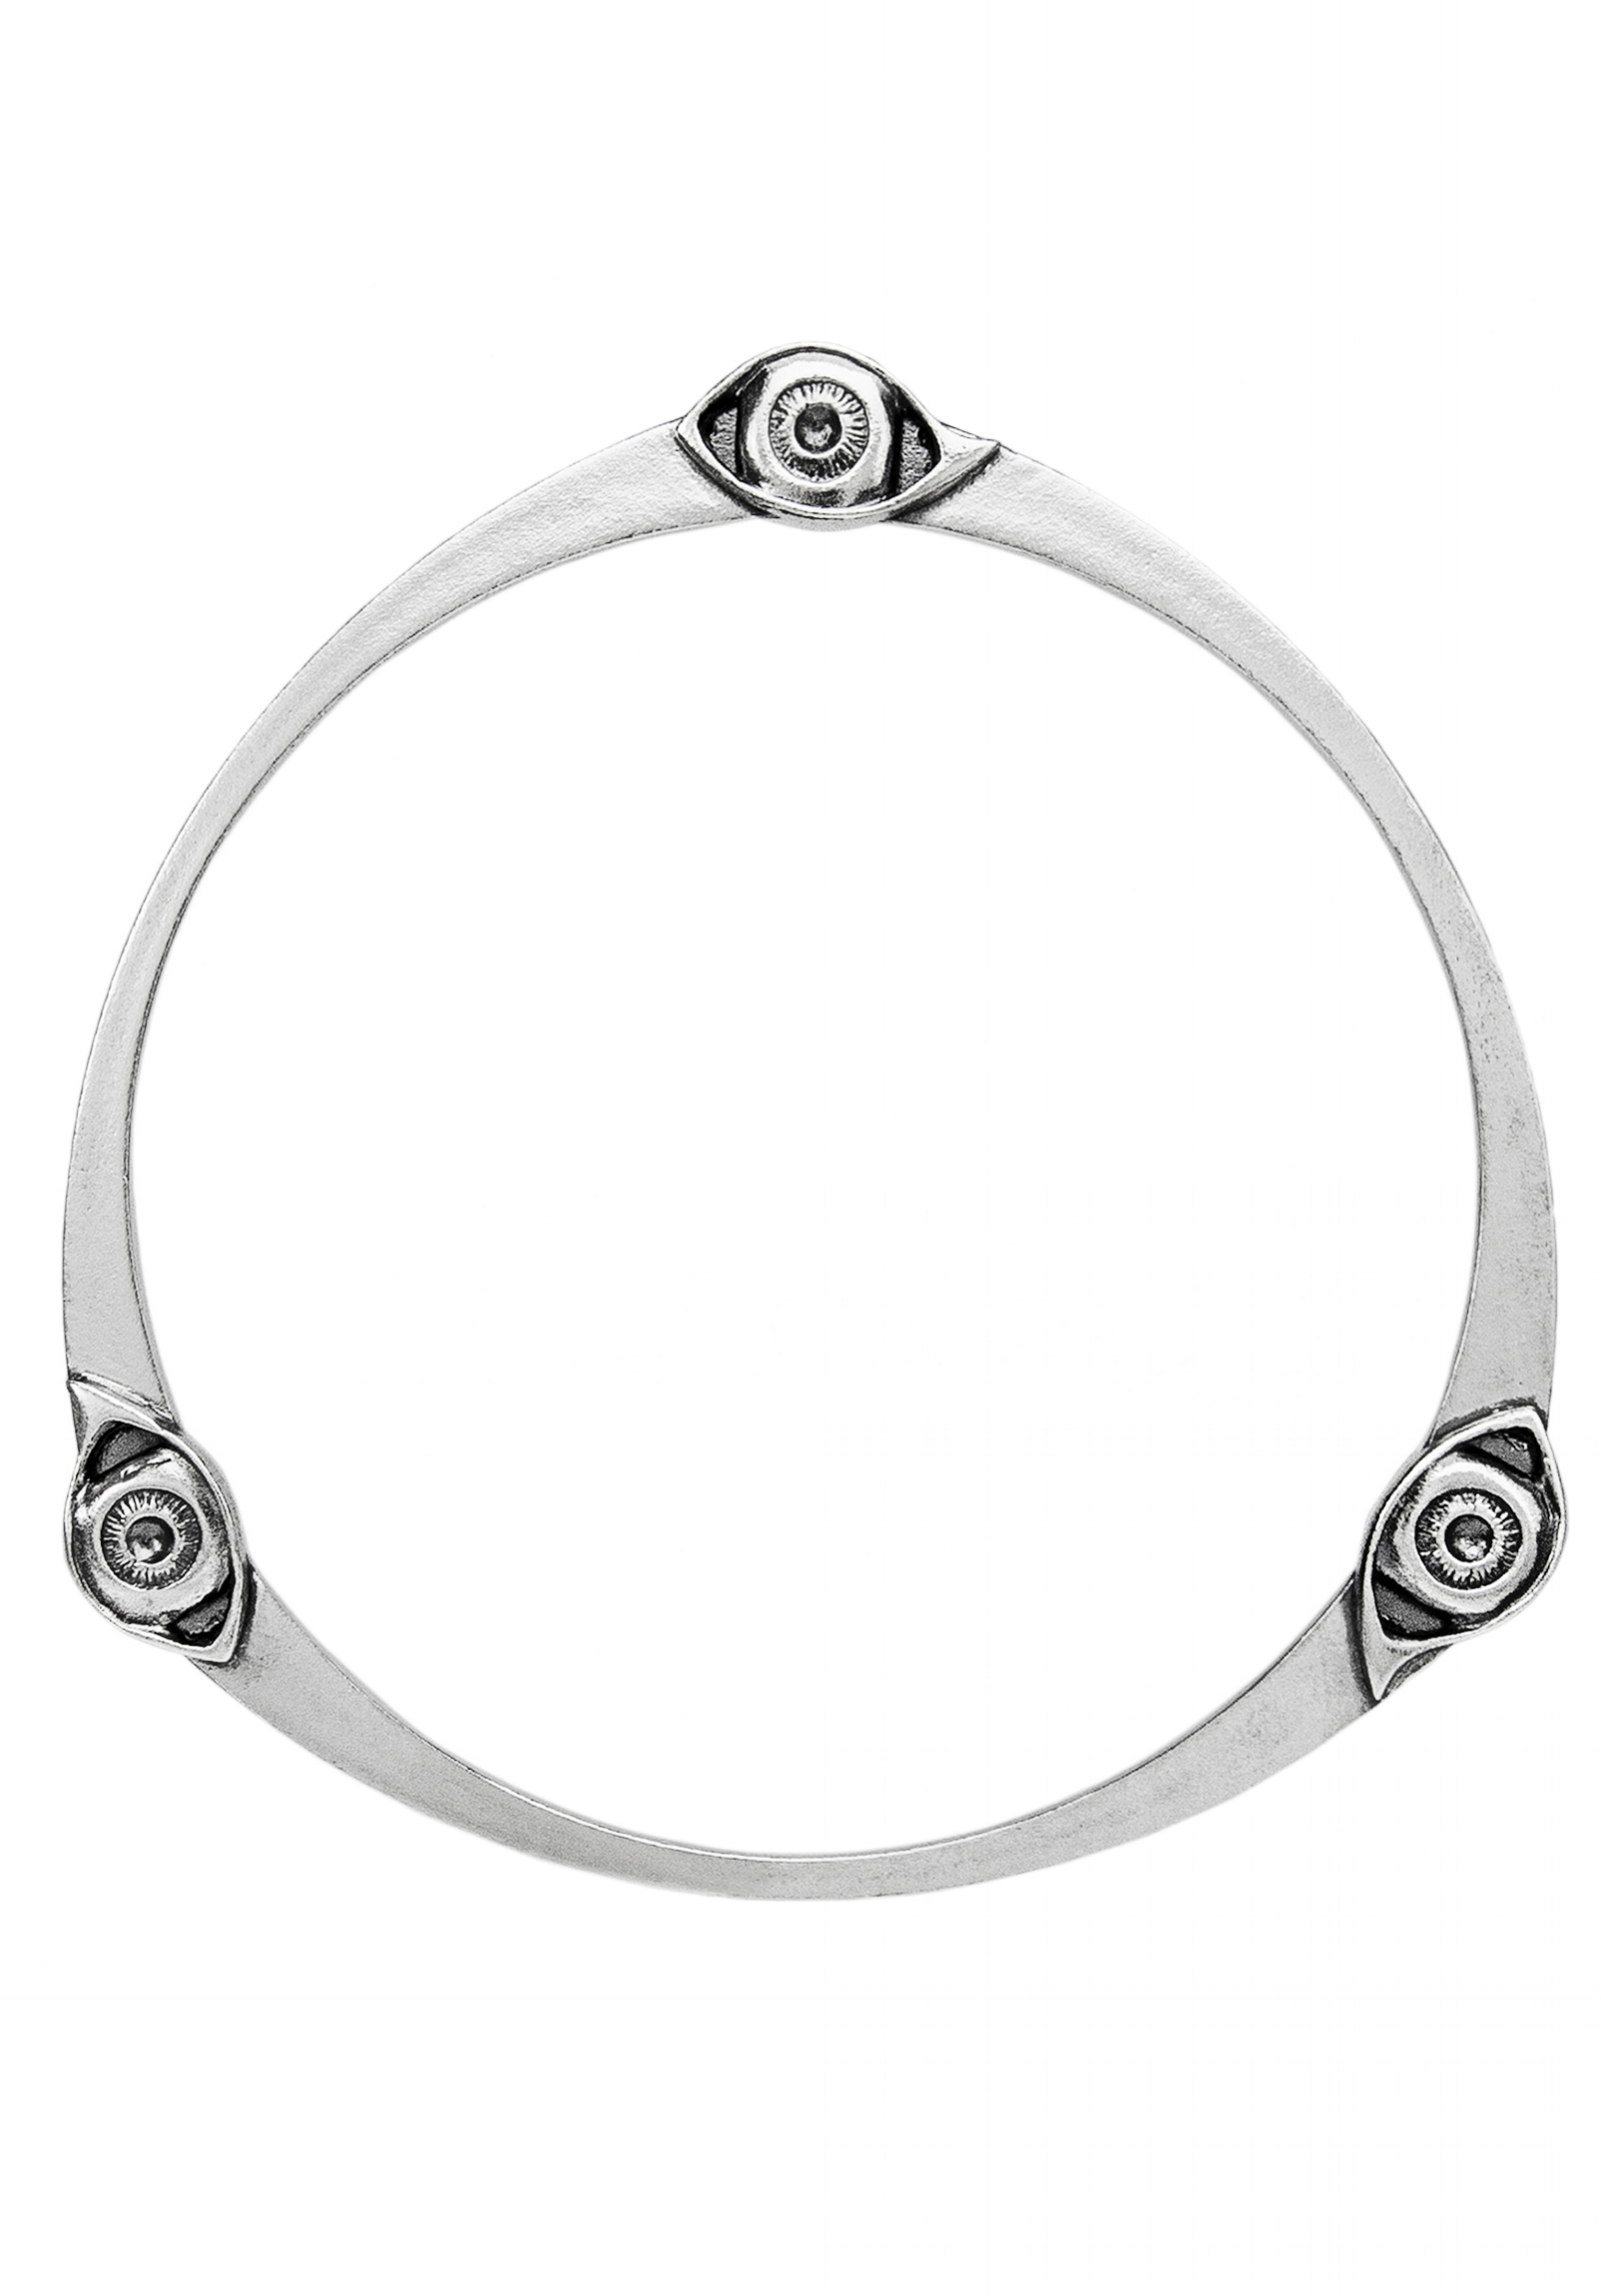 kozminka-bracelet-bangle-3-eye-silver.jpg